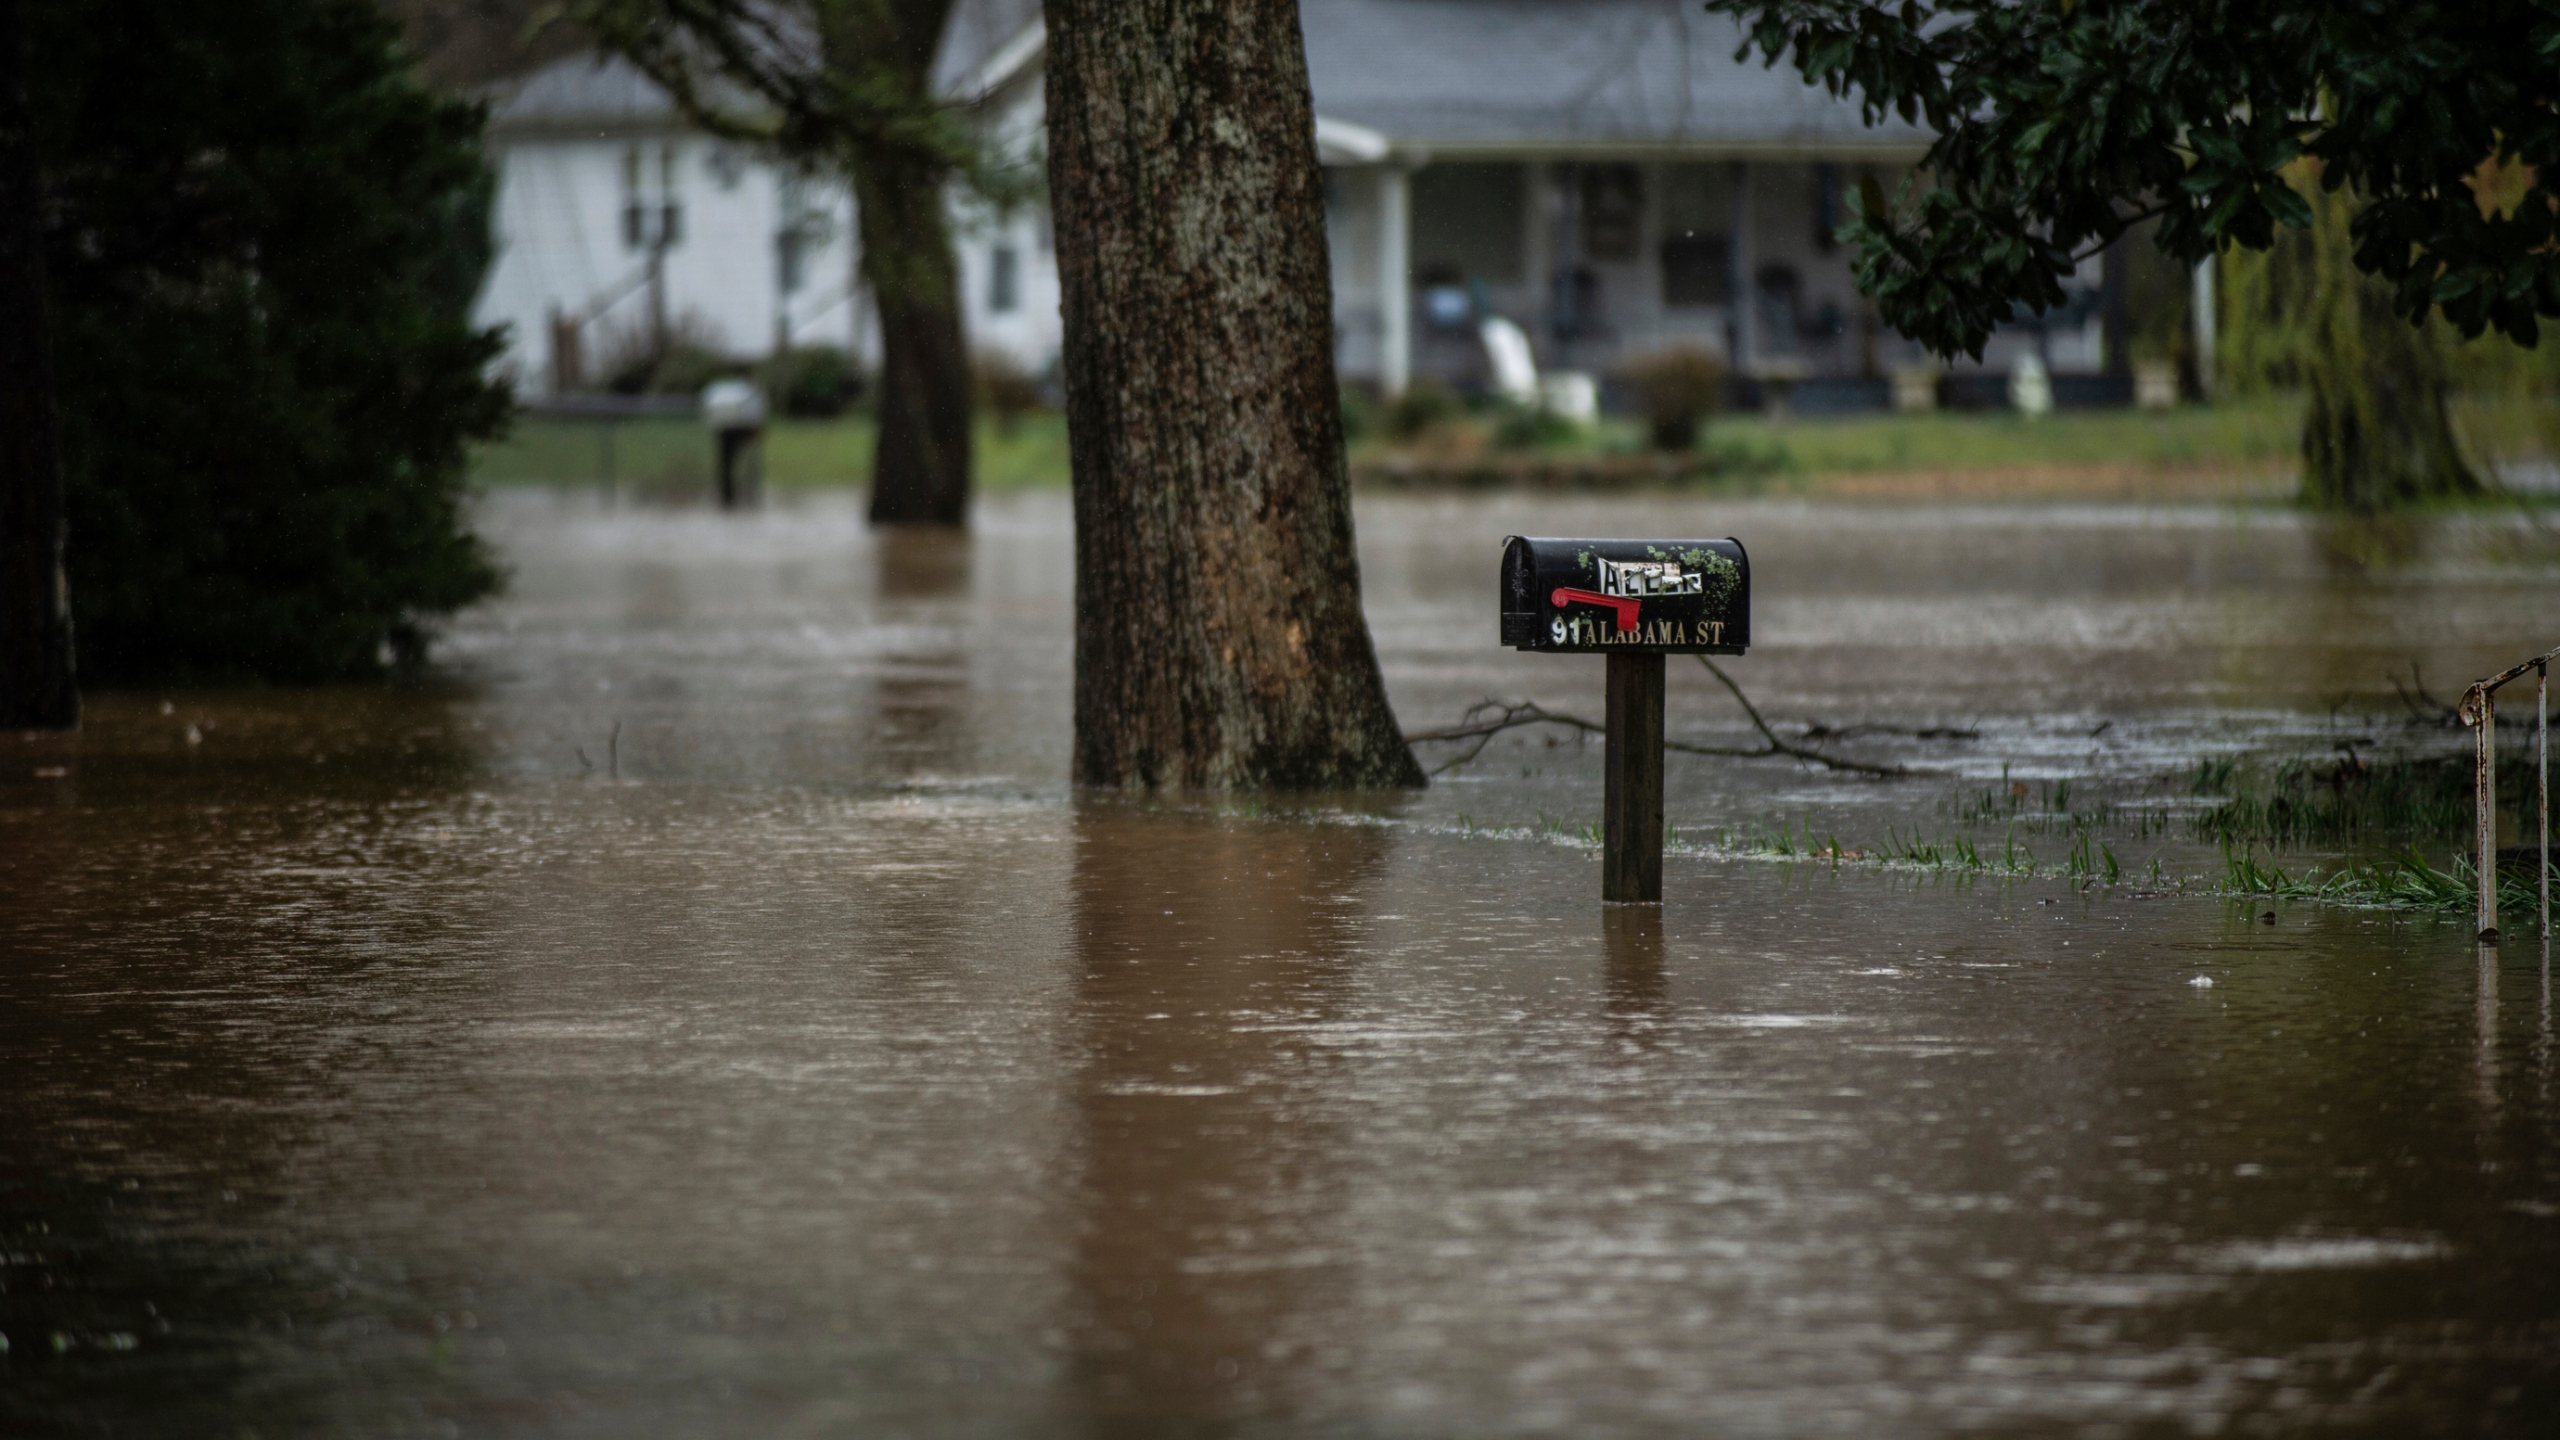 Deep_South_Flooding_35406-159532.jpg72361403